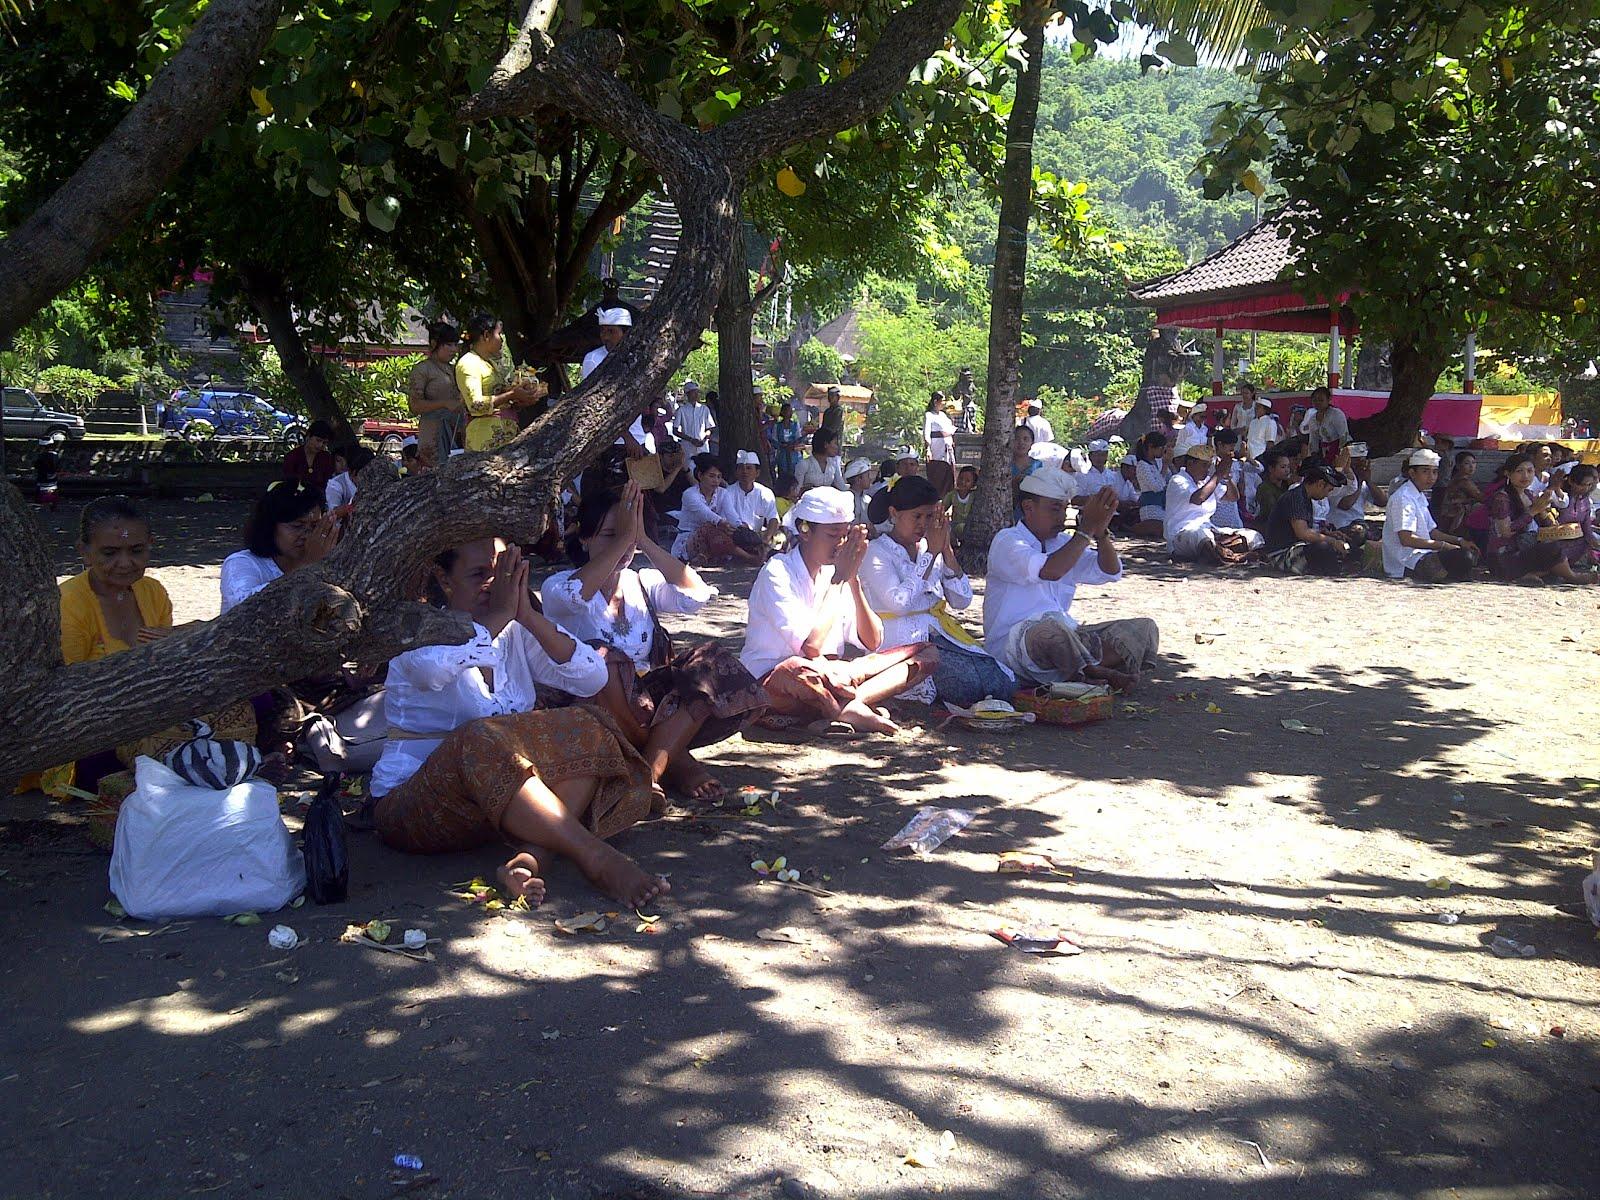 Devotos balineses, Templo Goa Lawah, Bali, vuelta al mundo, round the world, La vuelta al mundo de Asun y Ricardo